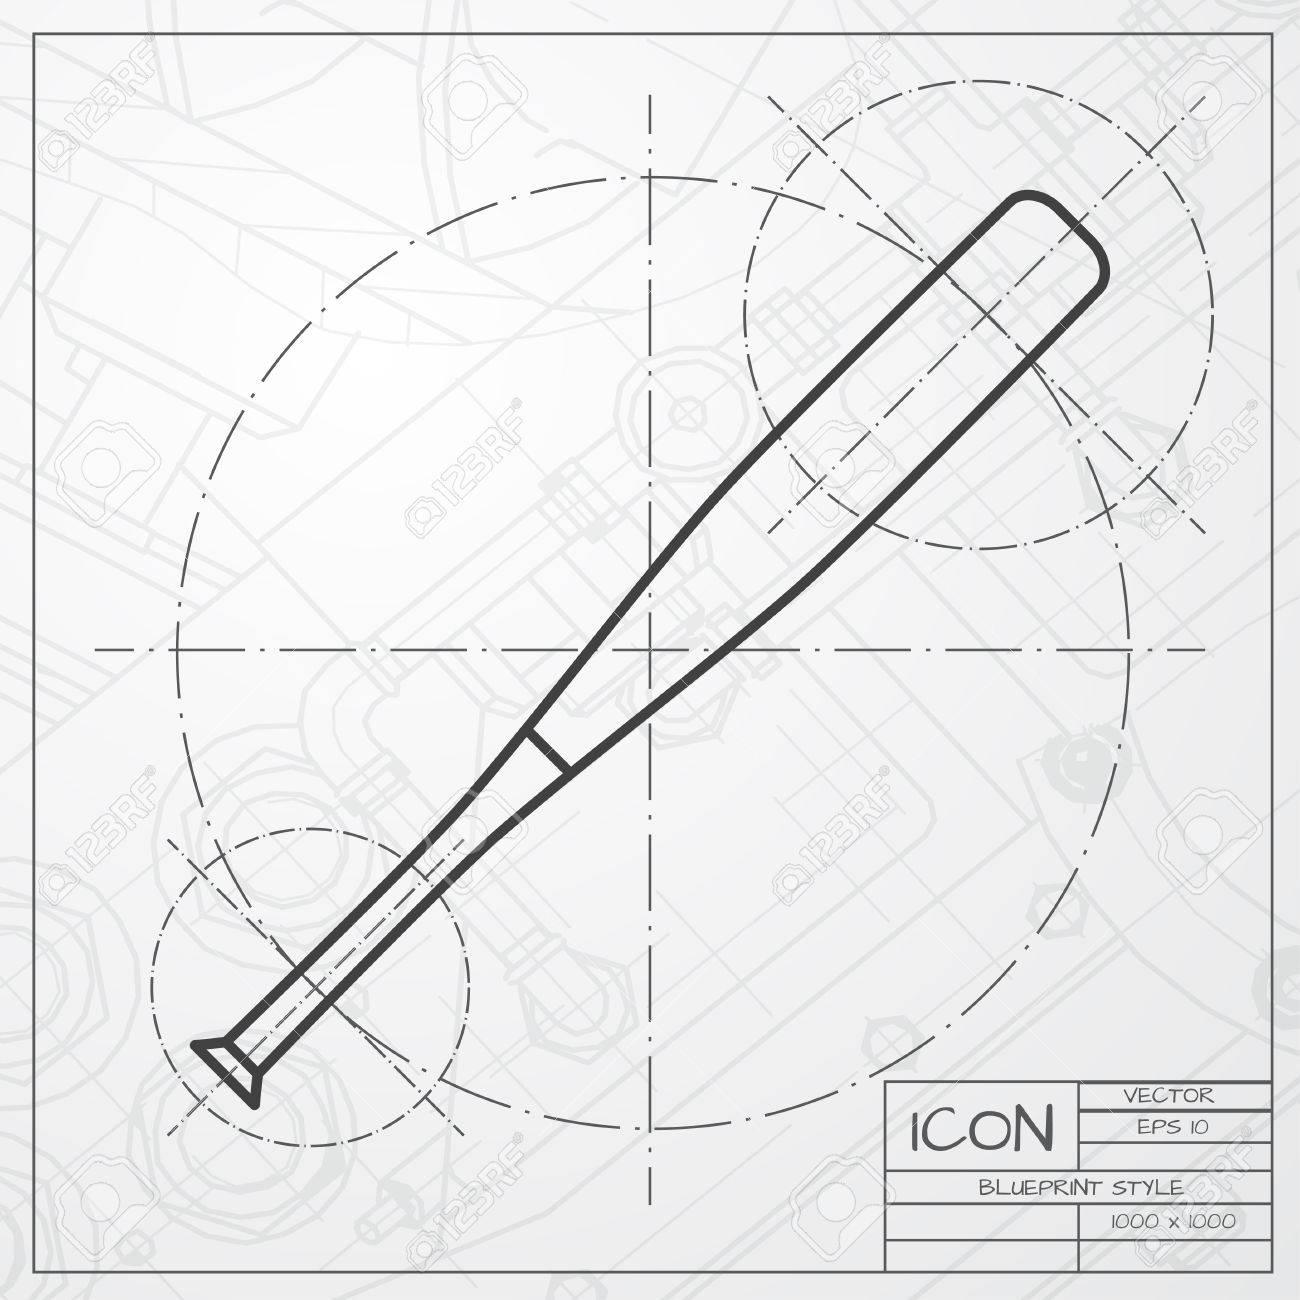 Vector classic blueprint of baseball bat icon on engineer and vector vector classic blueprint of baseball bat icon on engineer and architect background malvernweather Image collections